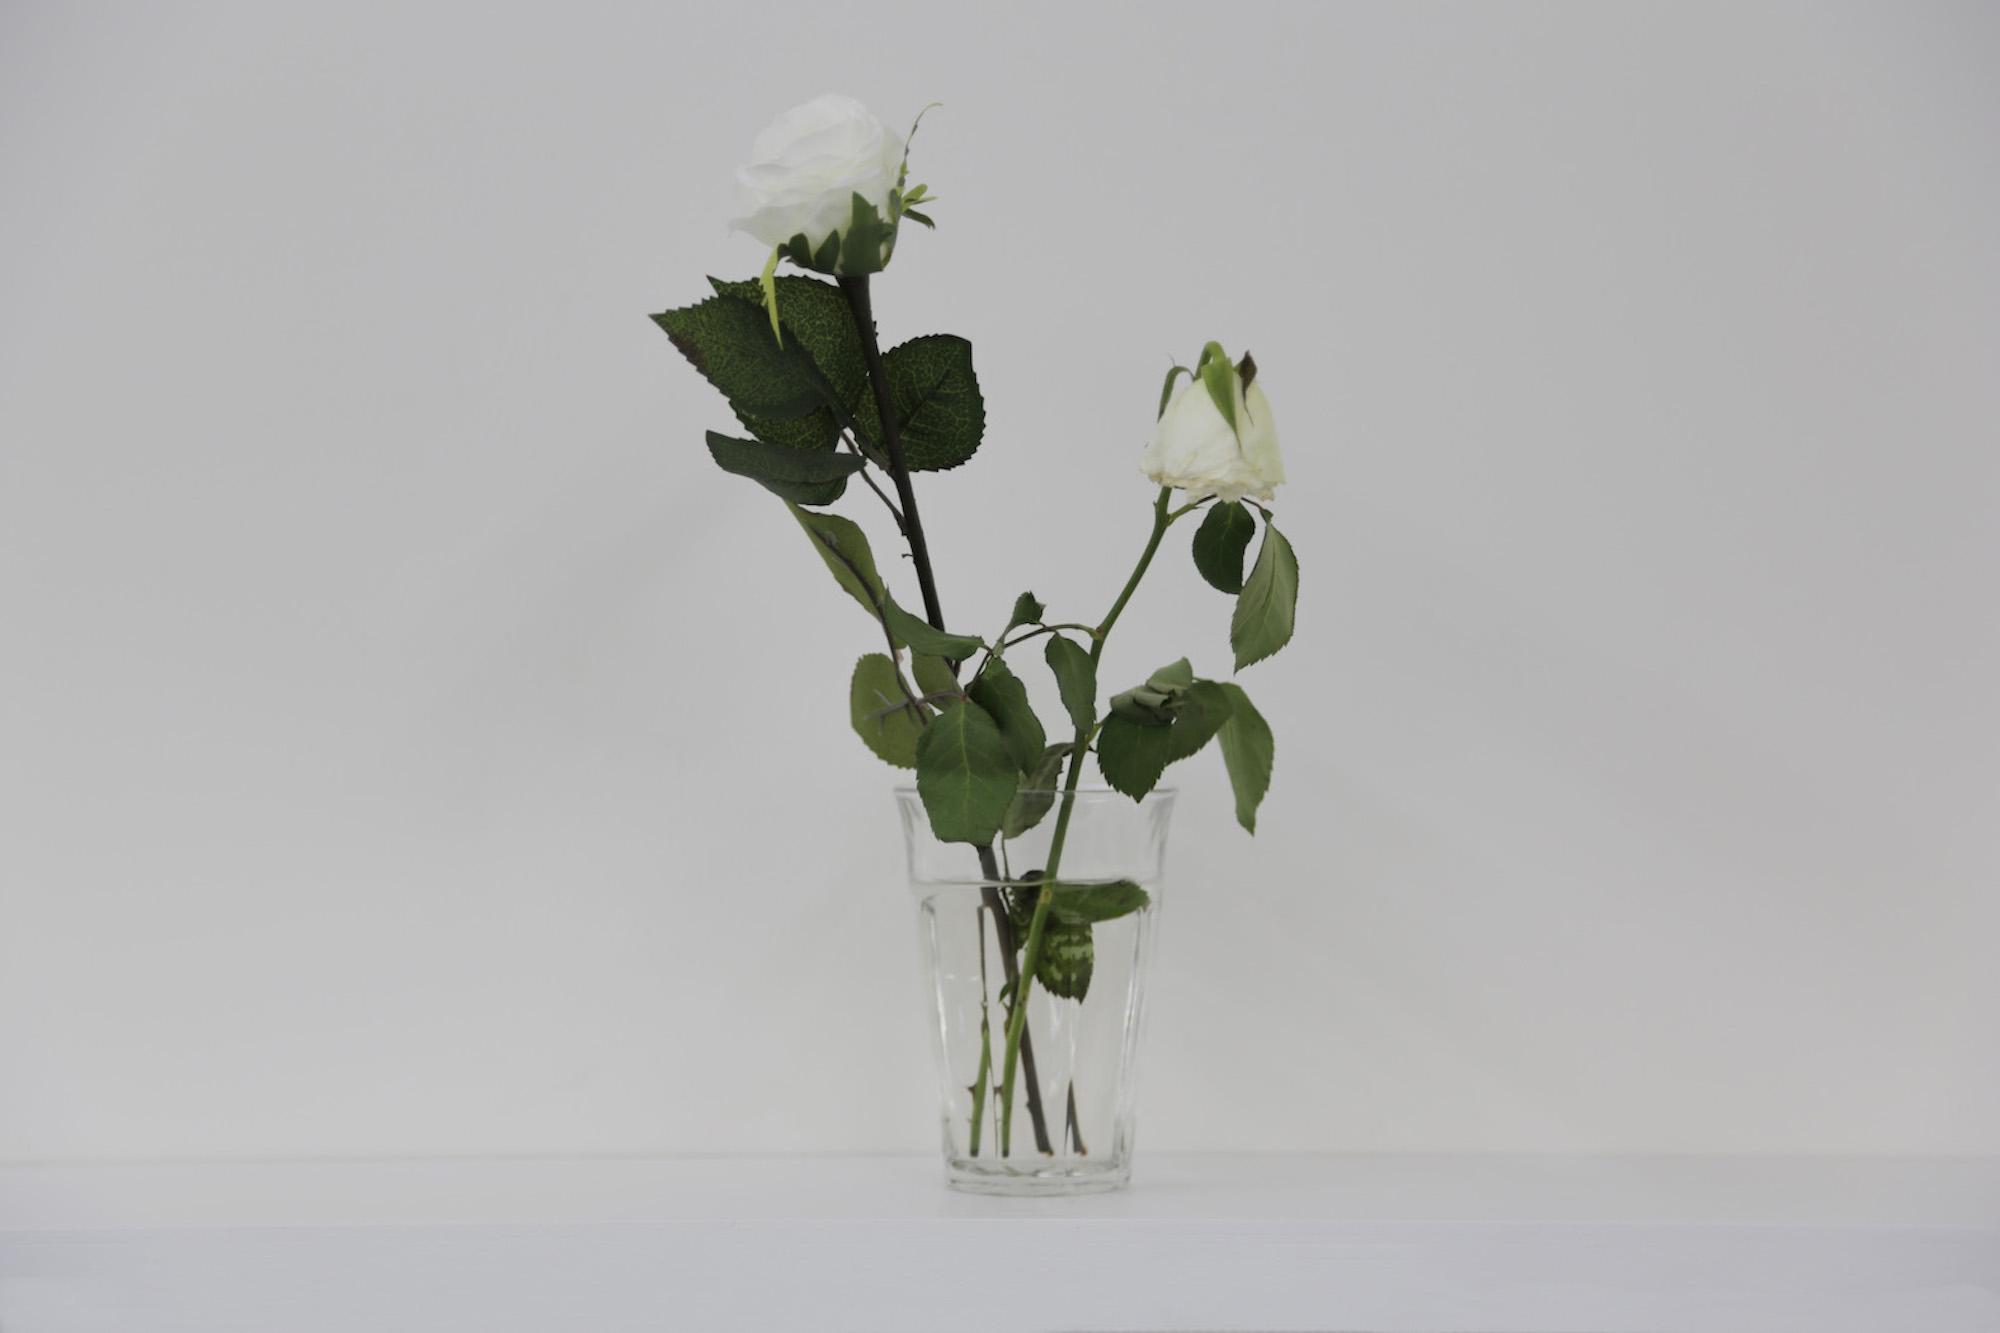 Stéphanie Saadé  Faux-jumeaux 2014 Natural white rose, artificial white rose, vase 15 x 30 cm